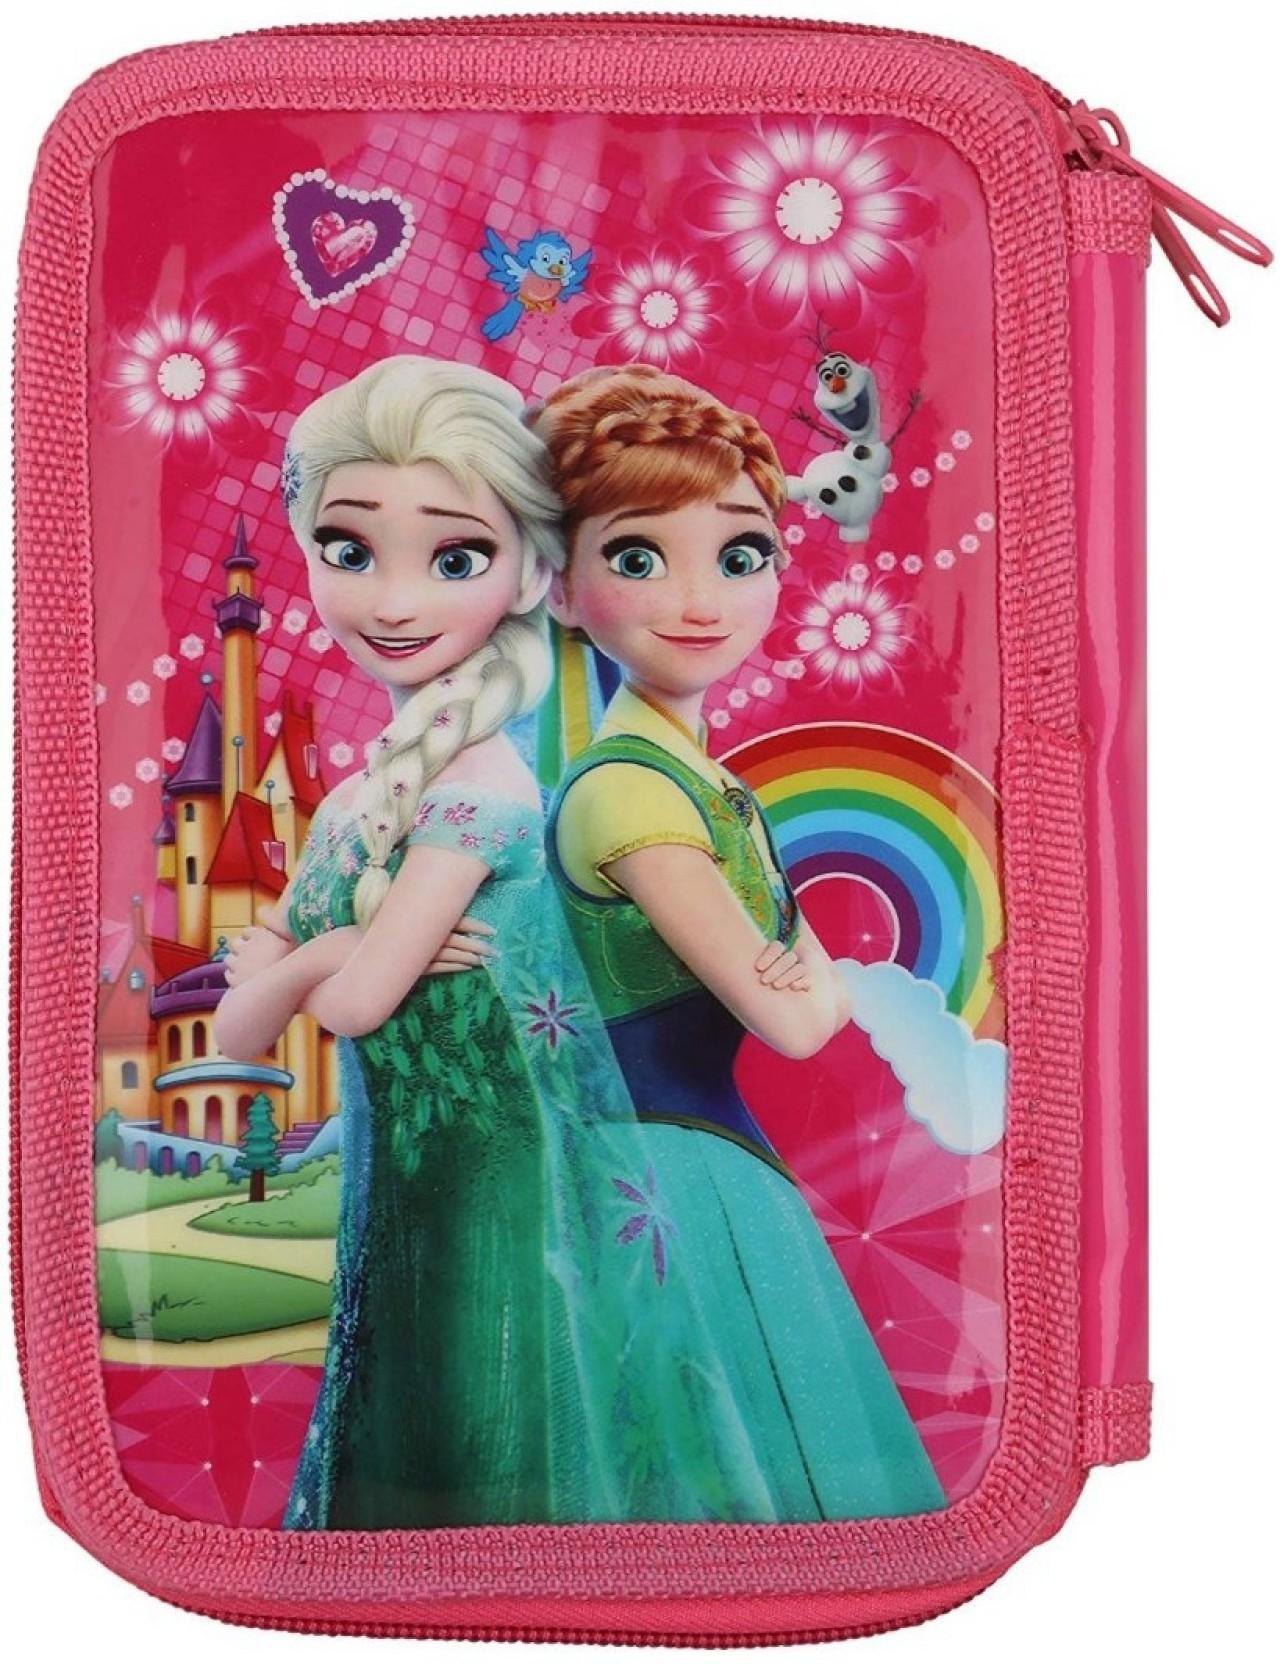 b03d76b4b1f14 Era Innovative Gifting pencil pouch Frozen Design Art Canvas Pencil Box  (Set of 1, Pink)